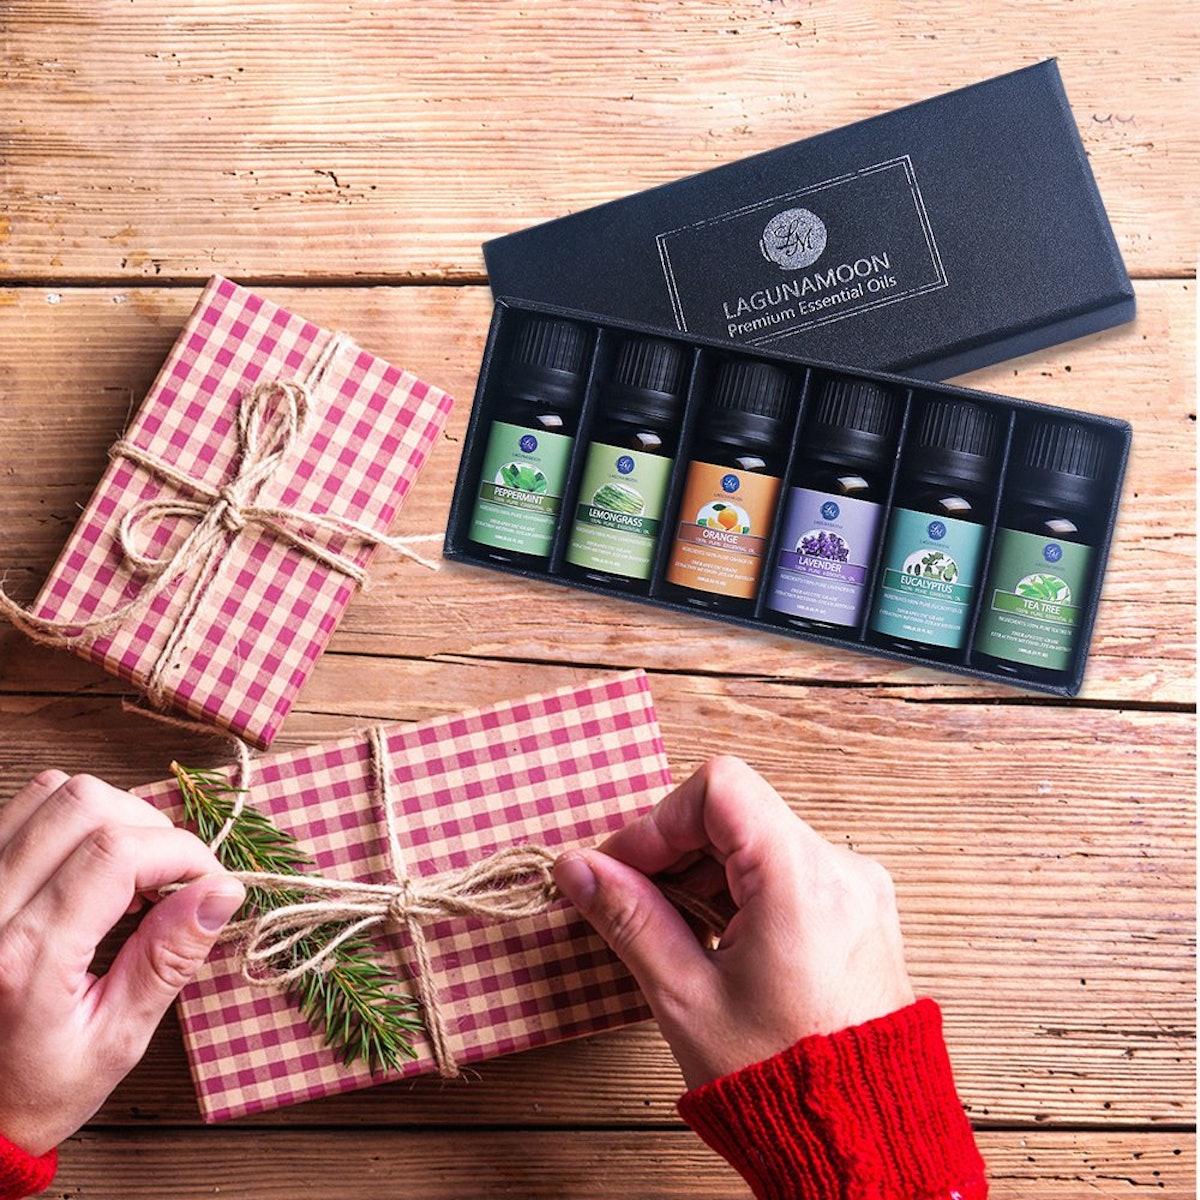 Lagunamoon Essential Oils (6-Pack)